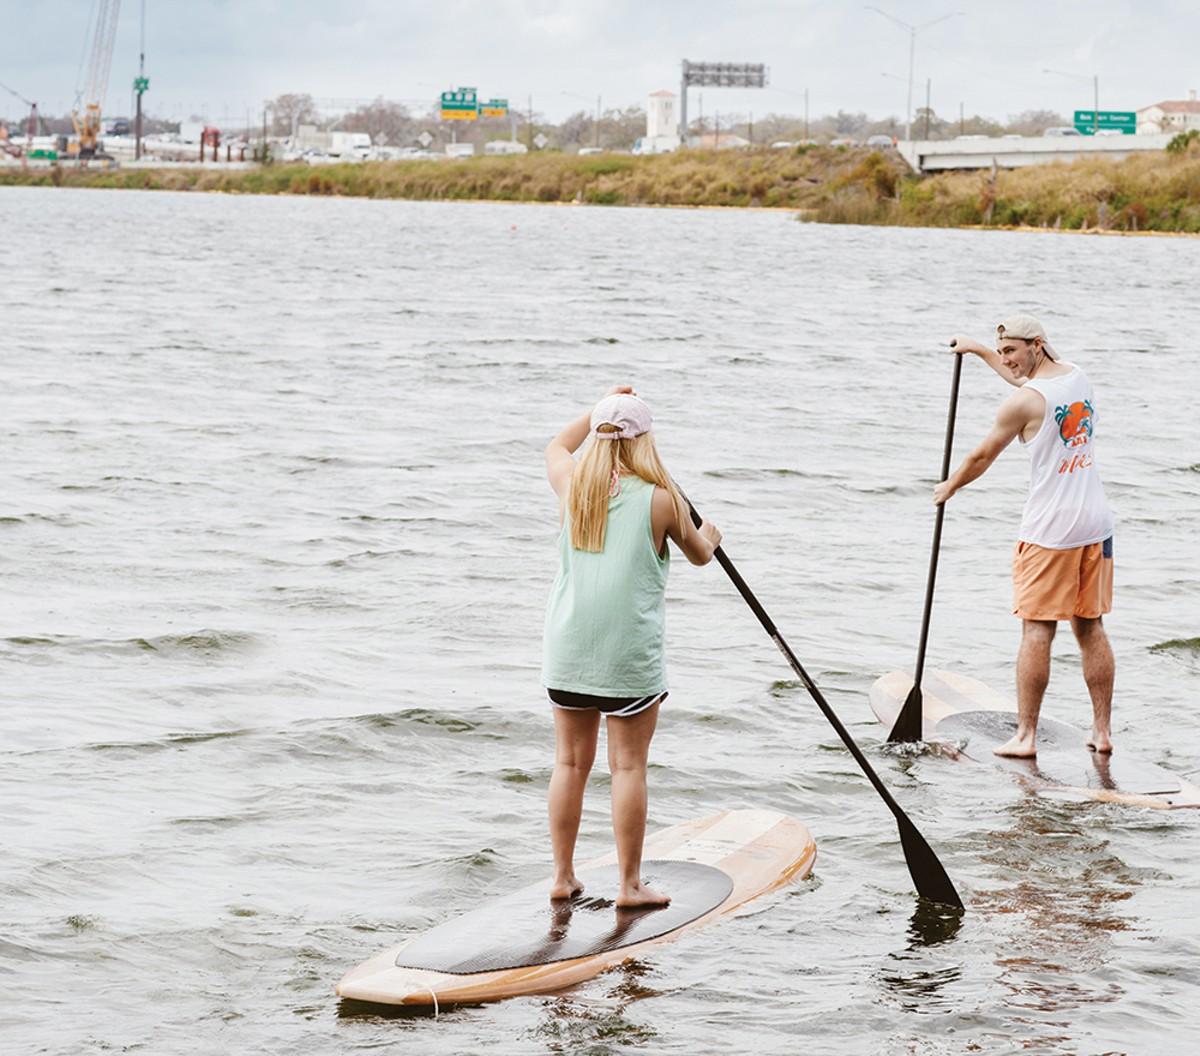 paddleboard-ivanhoe.jpg